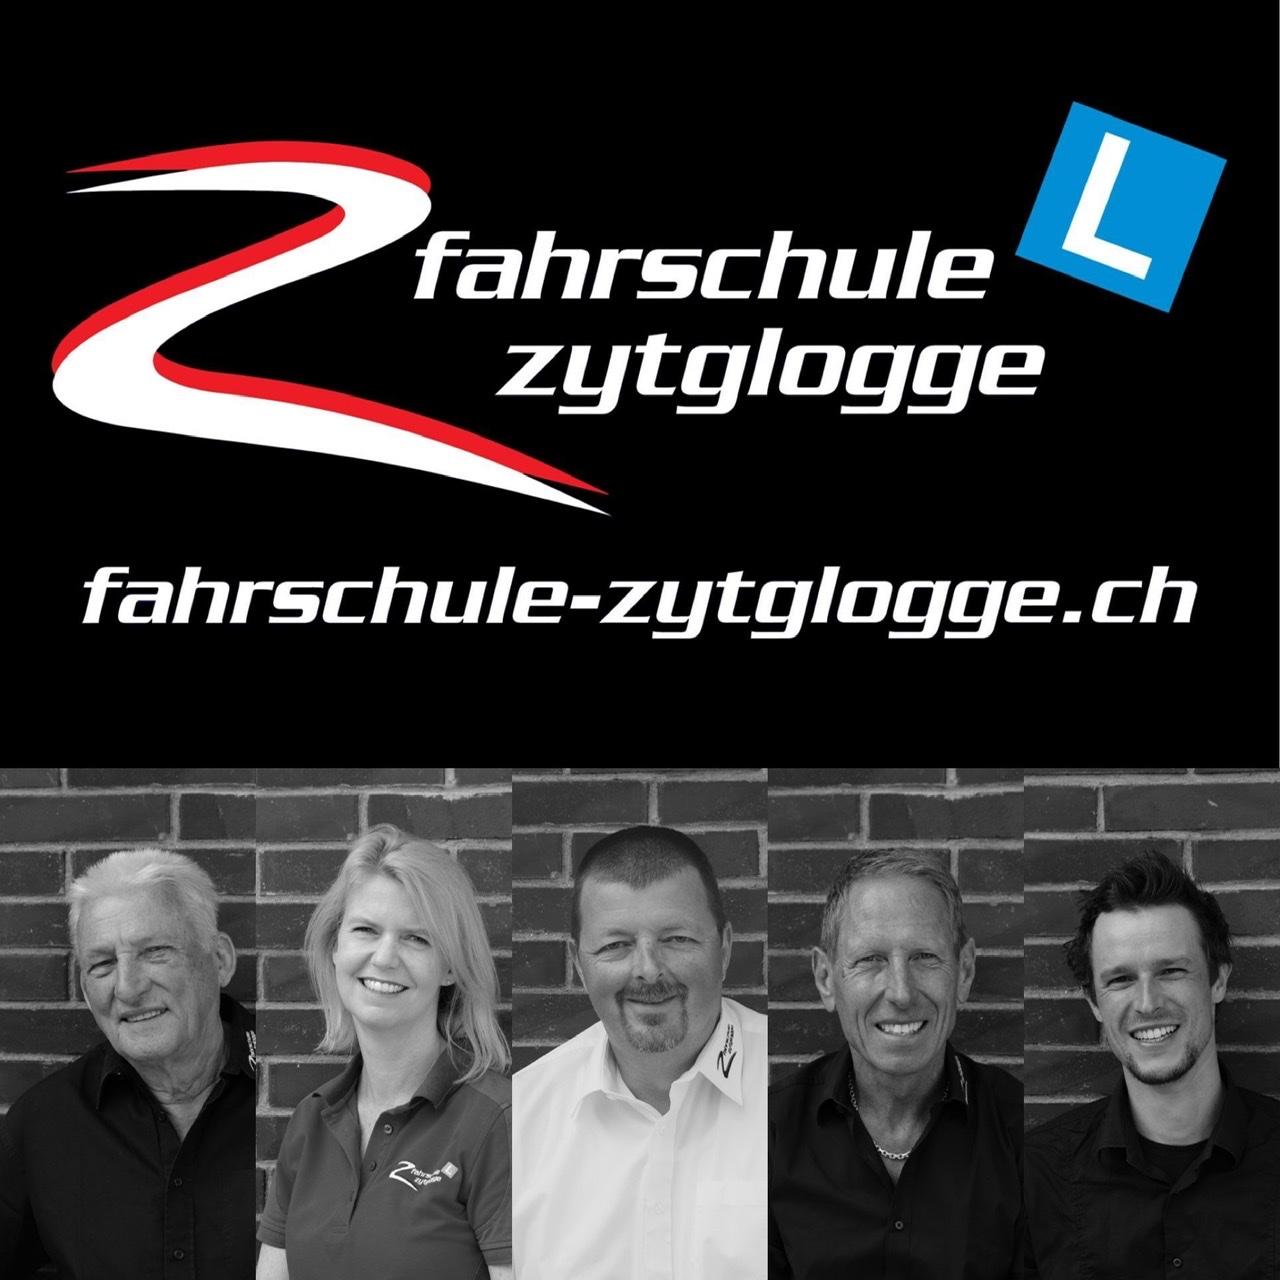 Bilder Fahrschule-Zytglogge Bern